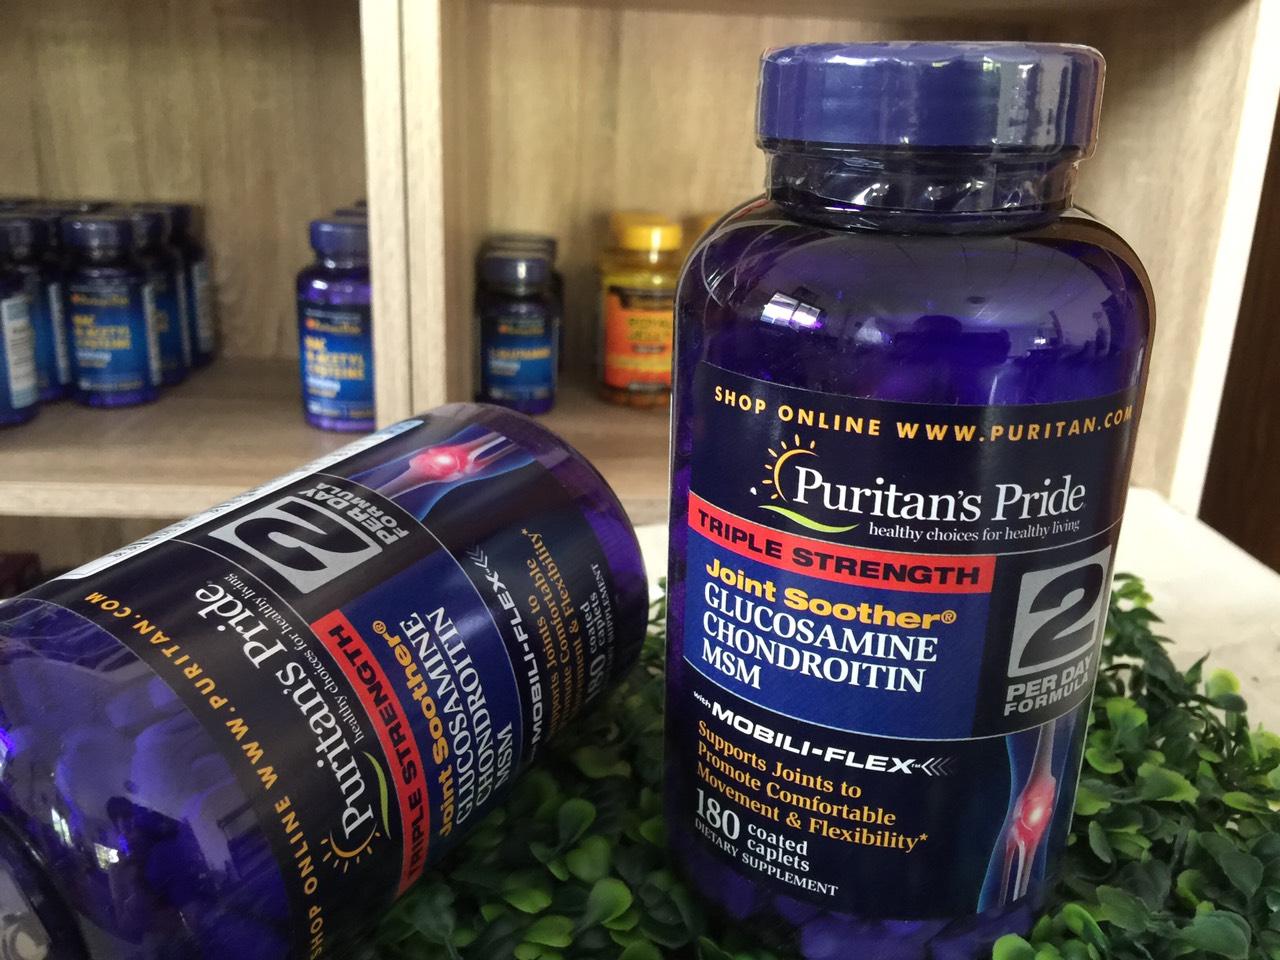 Puritans Pride Glucosamine 180 viên